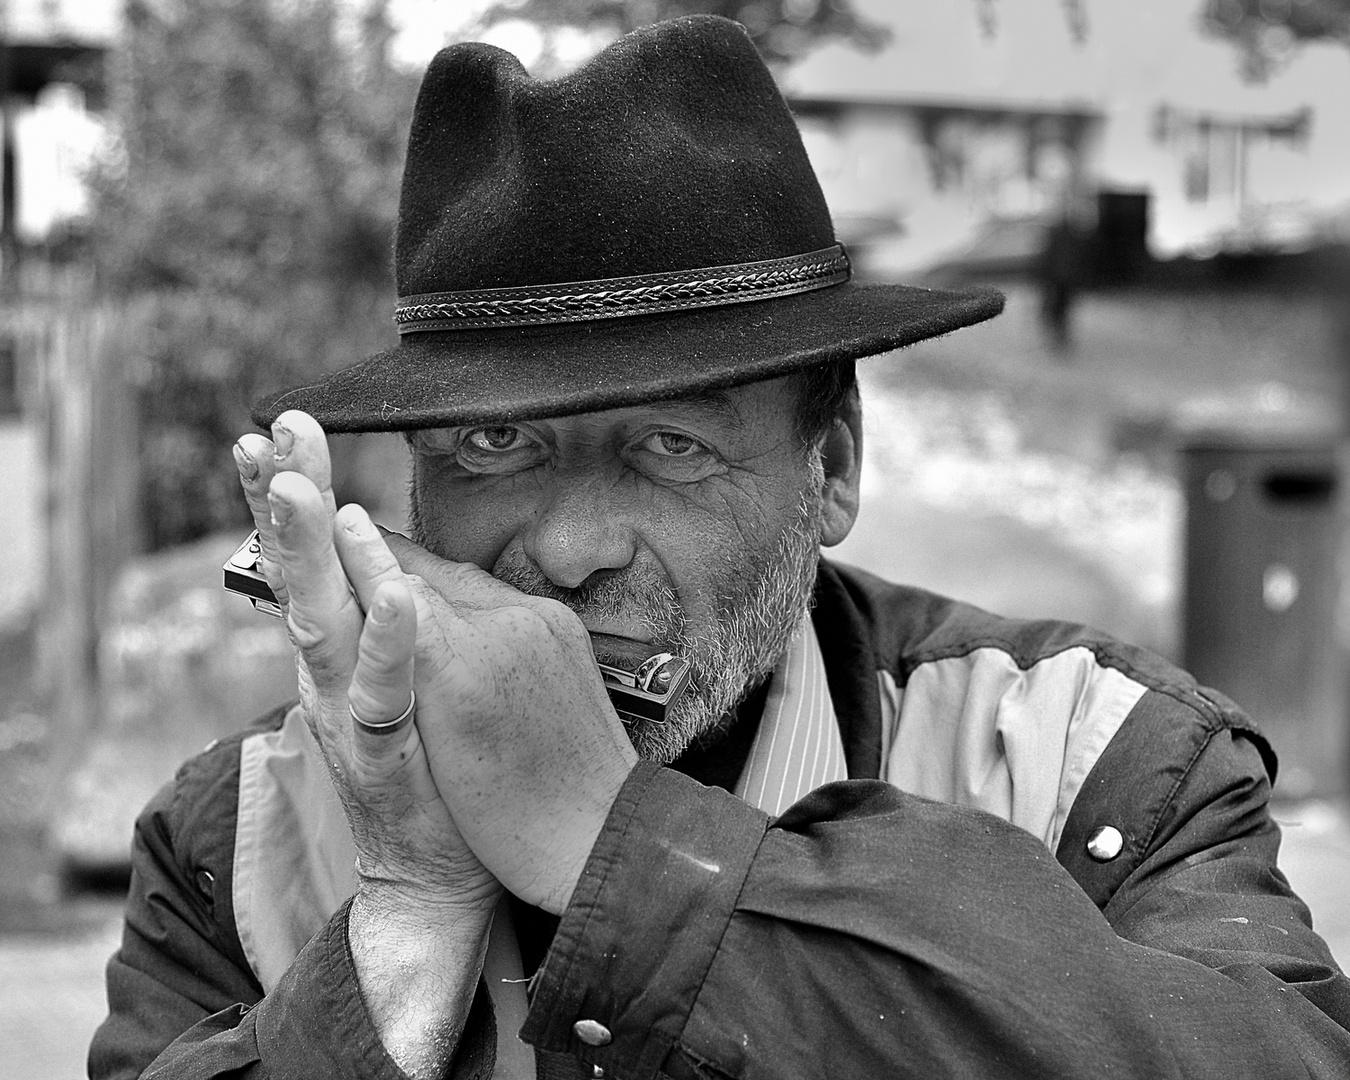 The street musician.